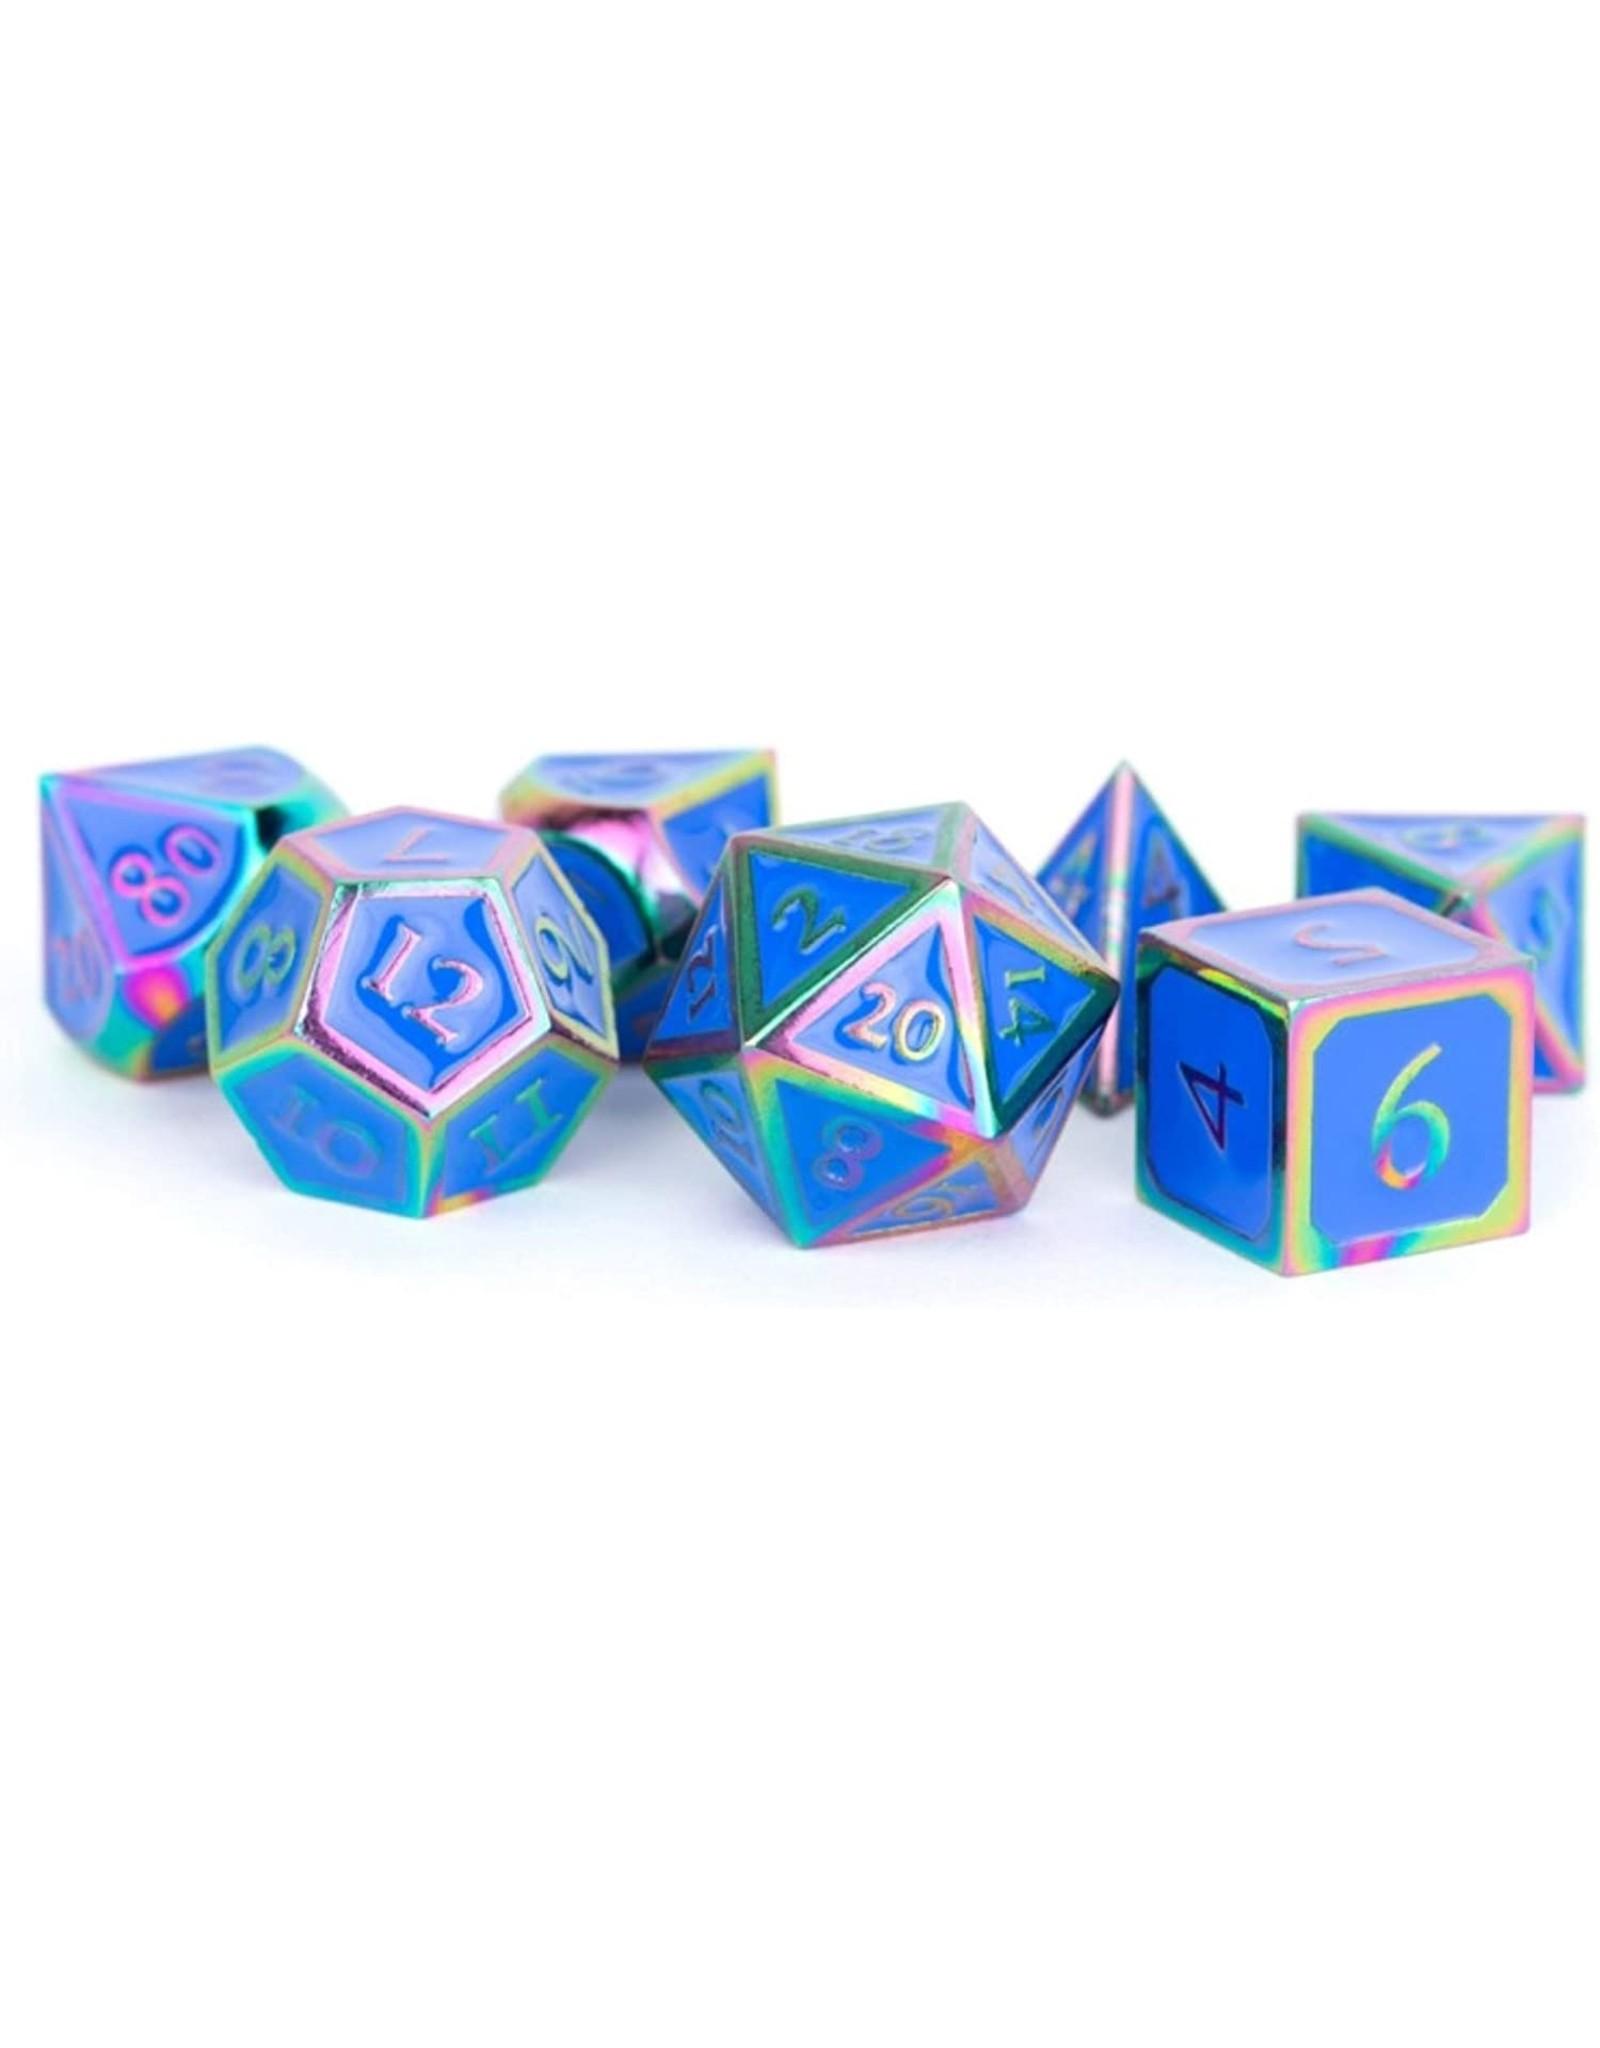 16mm Metal Polyhedral Dice Set: Rainbow with Blue Enamel